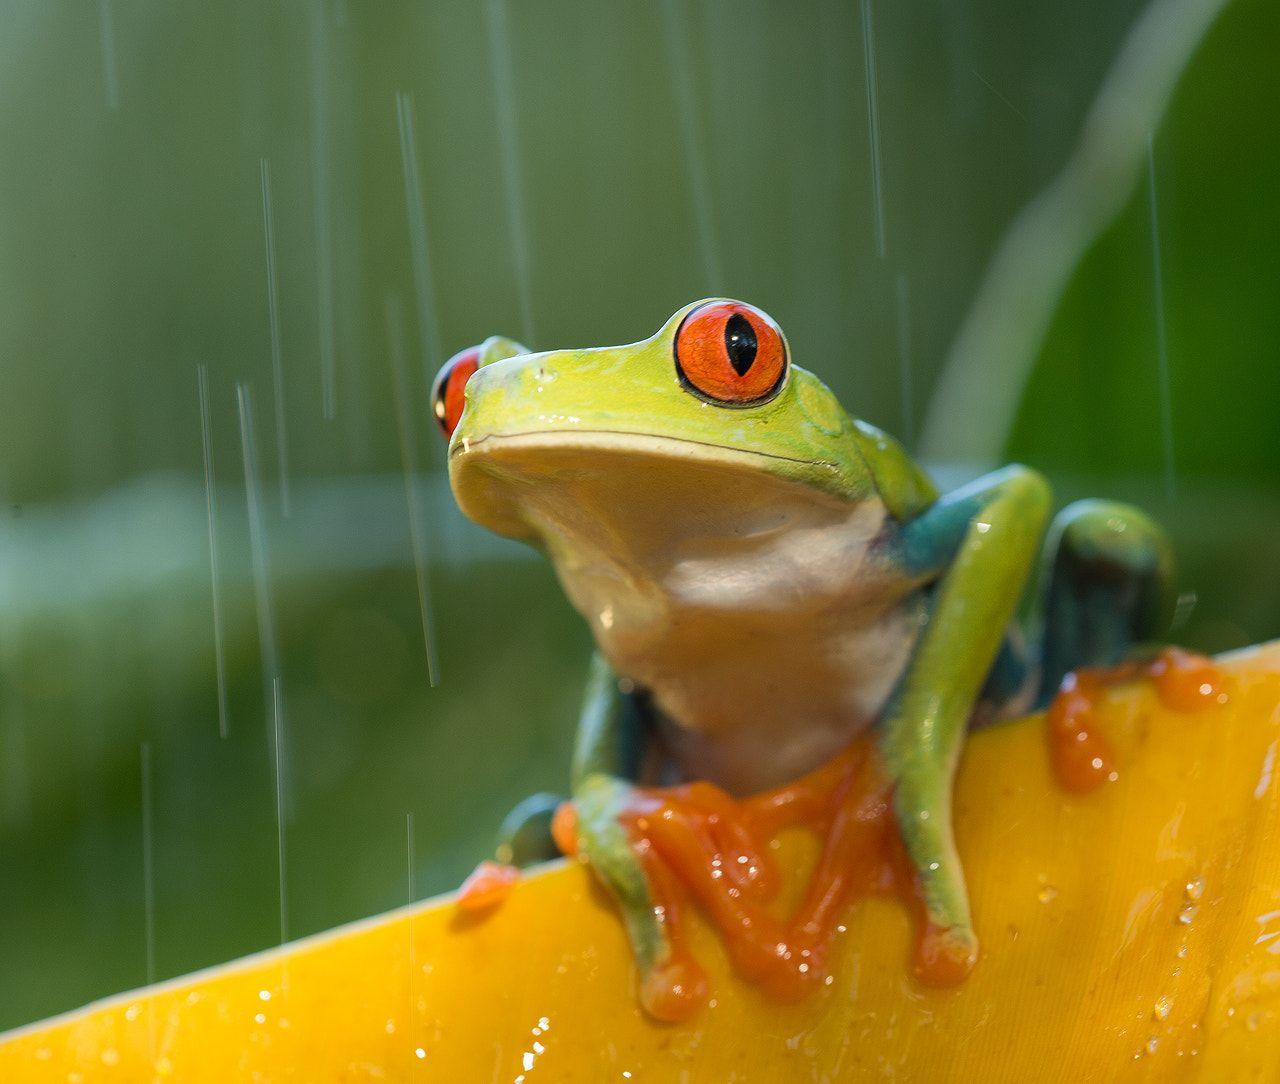 Red-eyed tree frog - Red-eyed tree frog, captive.